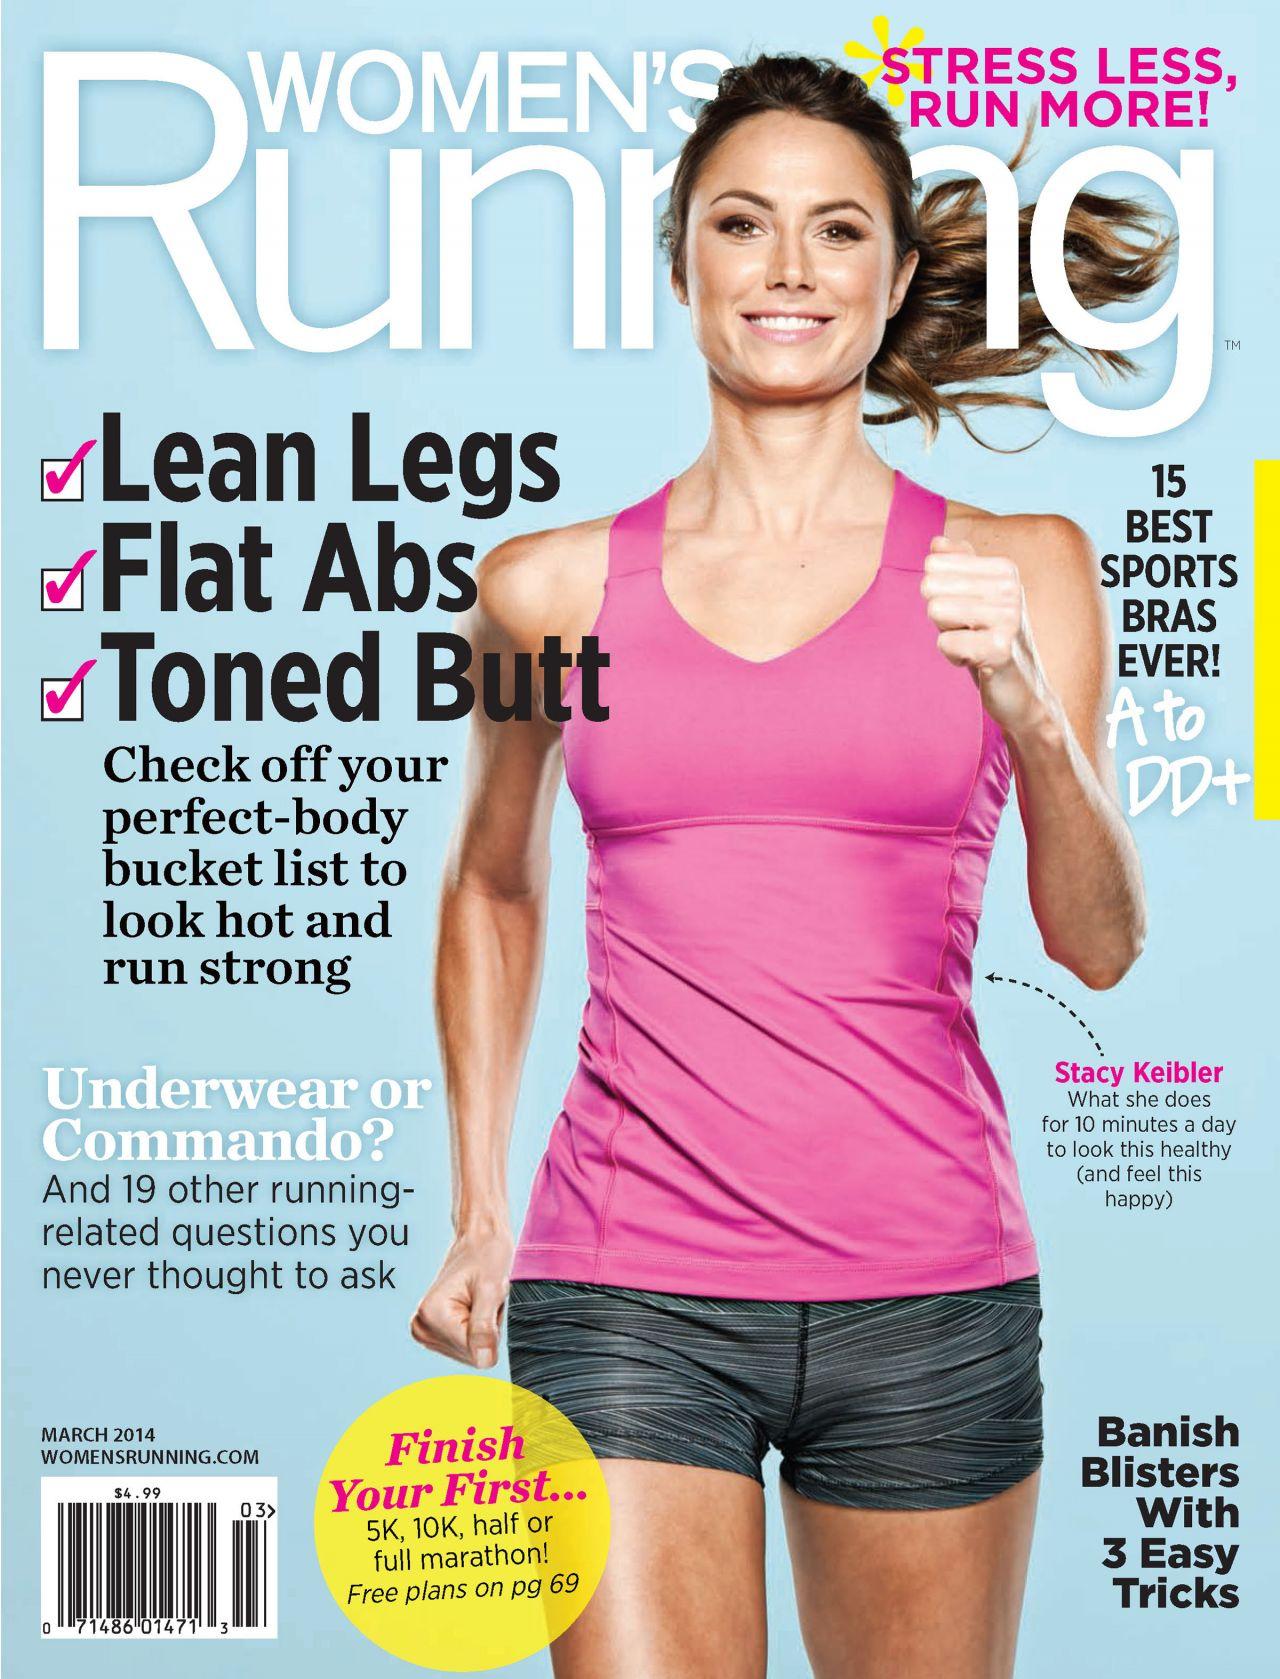 stacy-keibler-women-s-running-magazine-march-2014-cover_1.jpg